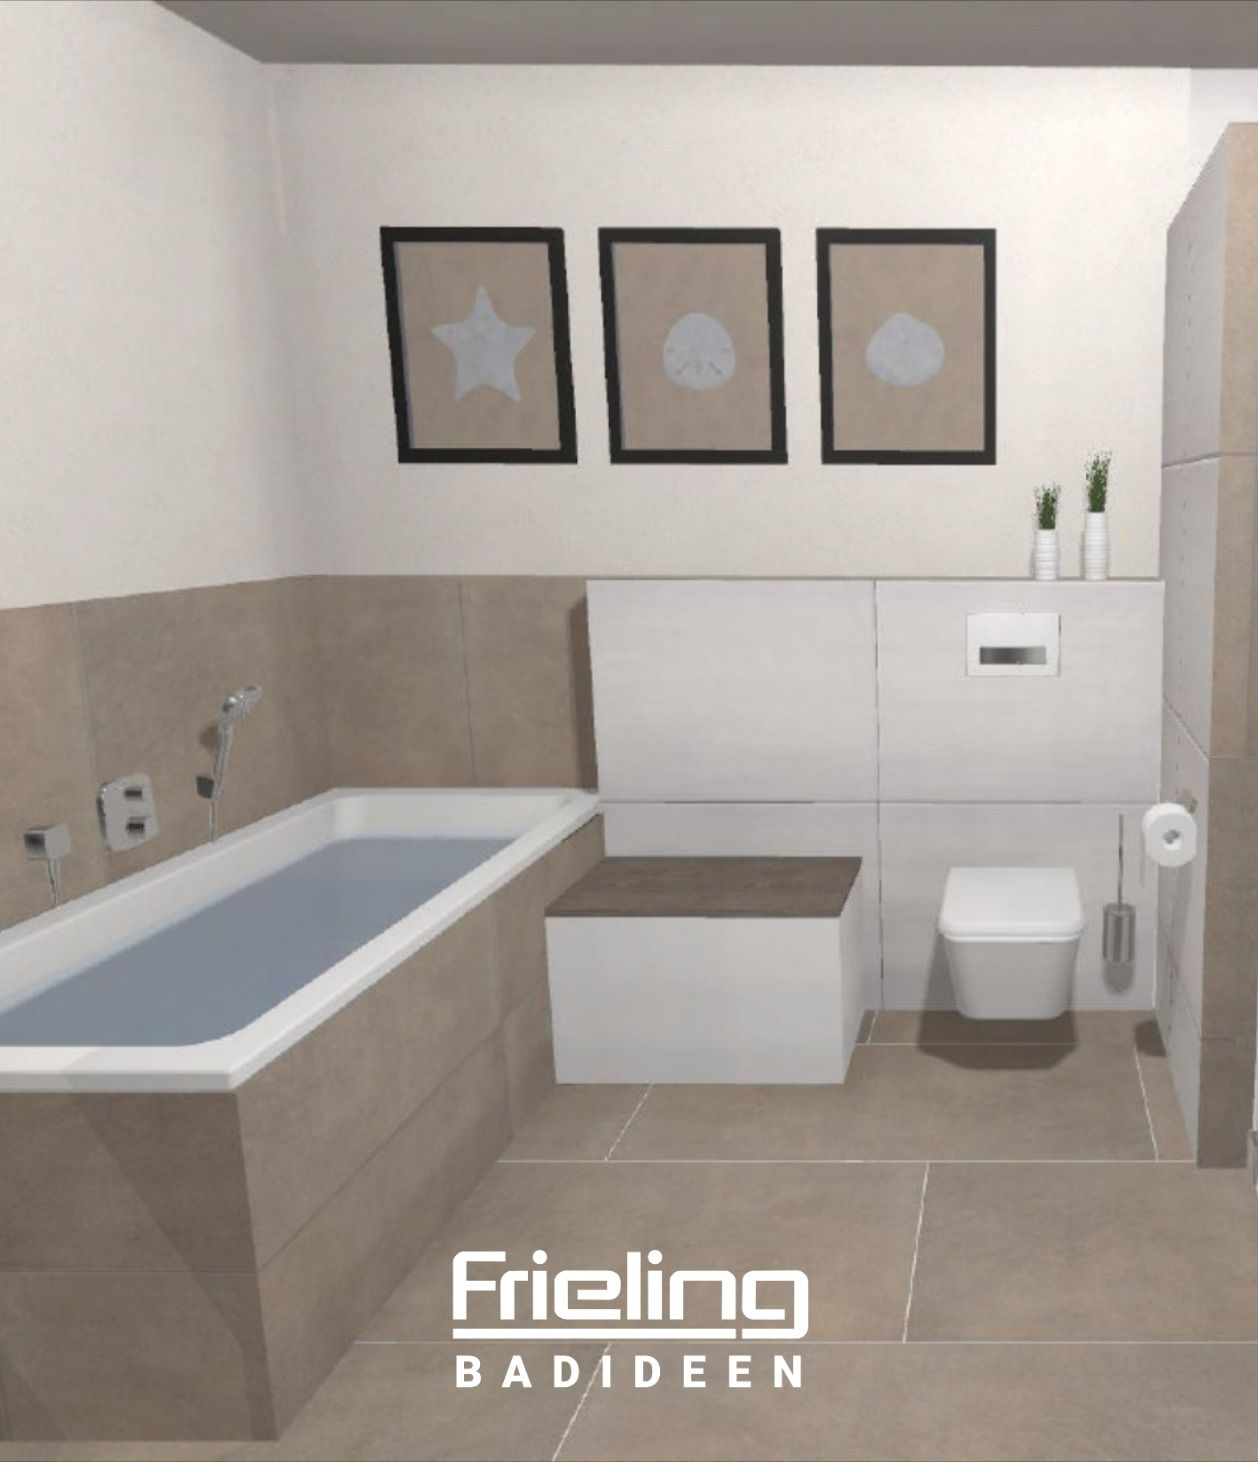 Das Grosse Familienbadezimmer 3d Planung Duschabtrennung Sitzbank Im Badezimmer 15 Qm In 2020 Grosse Badezimmer Badezimmer Duschabtrennung